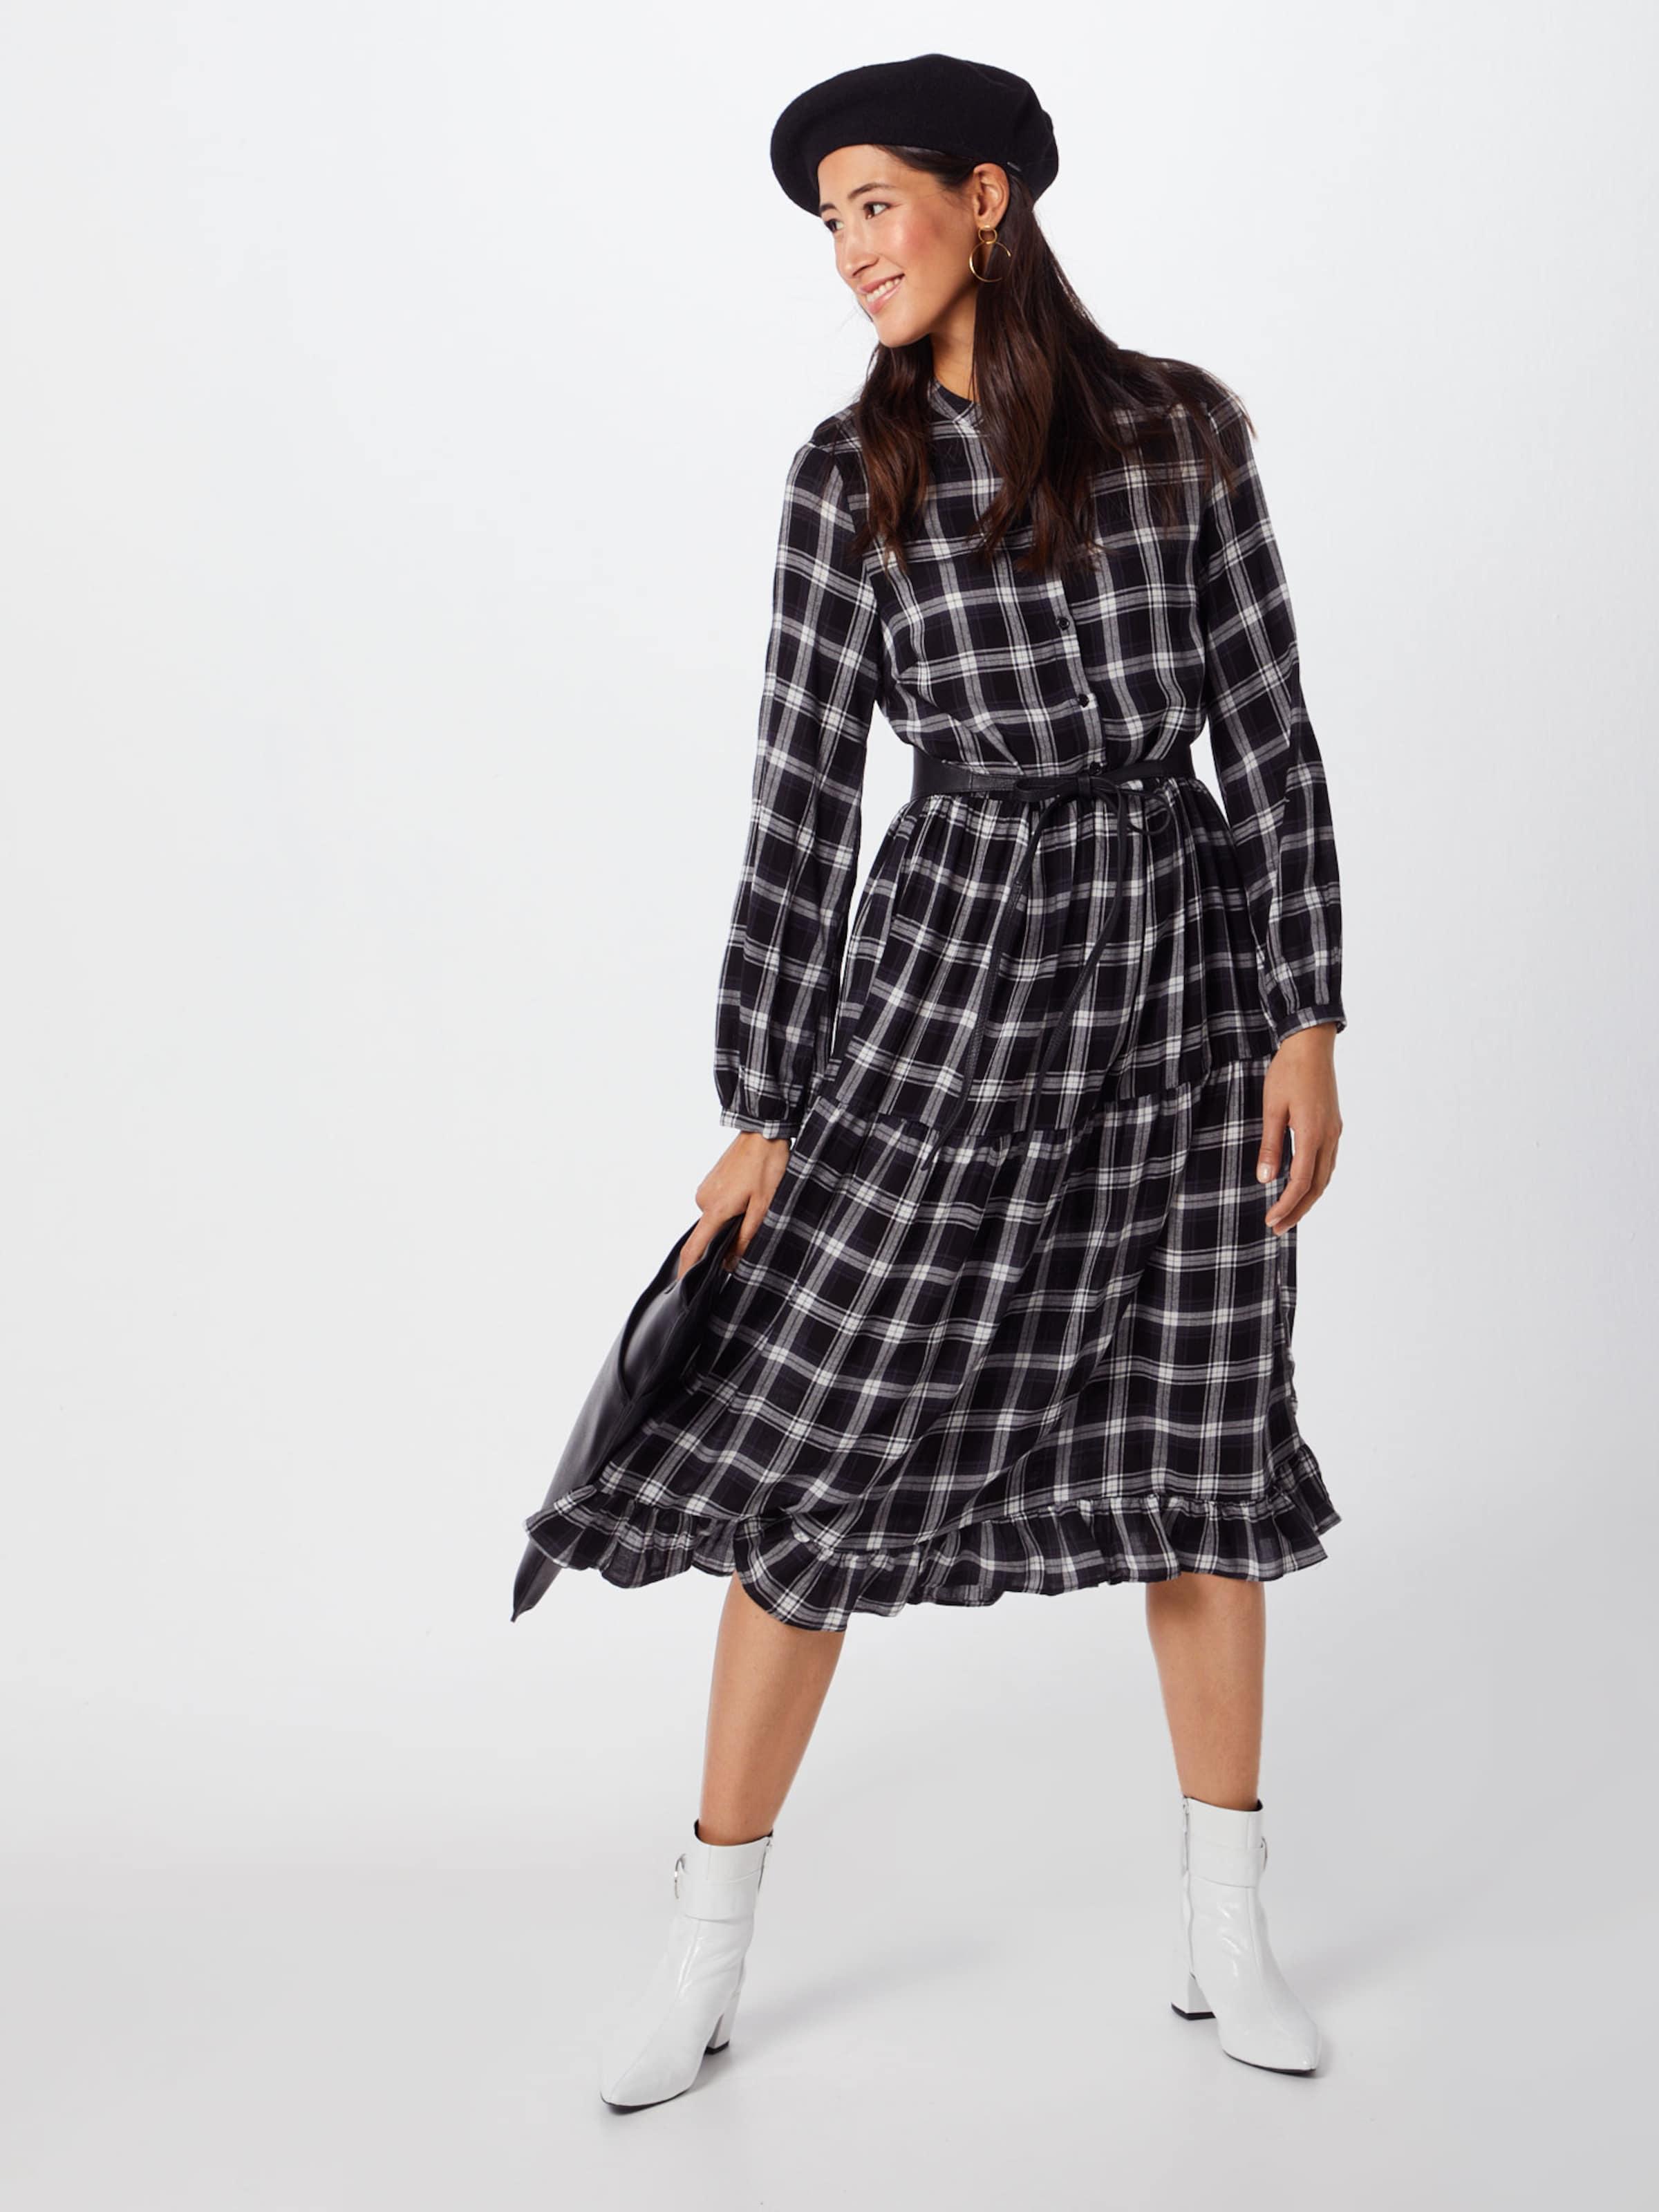 L s Vila En Dress' Robe NoirBlanc 'vikallie 9eWD2bEYHI